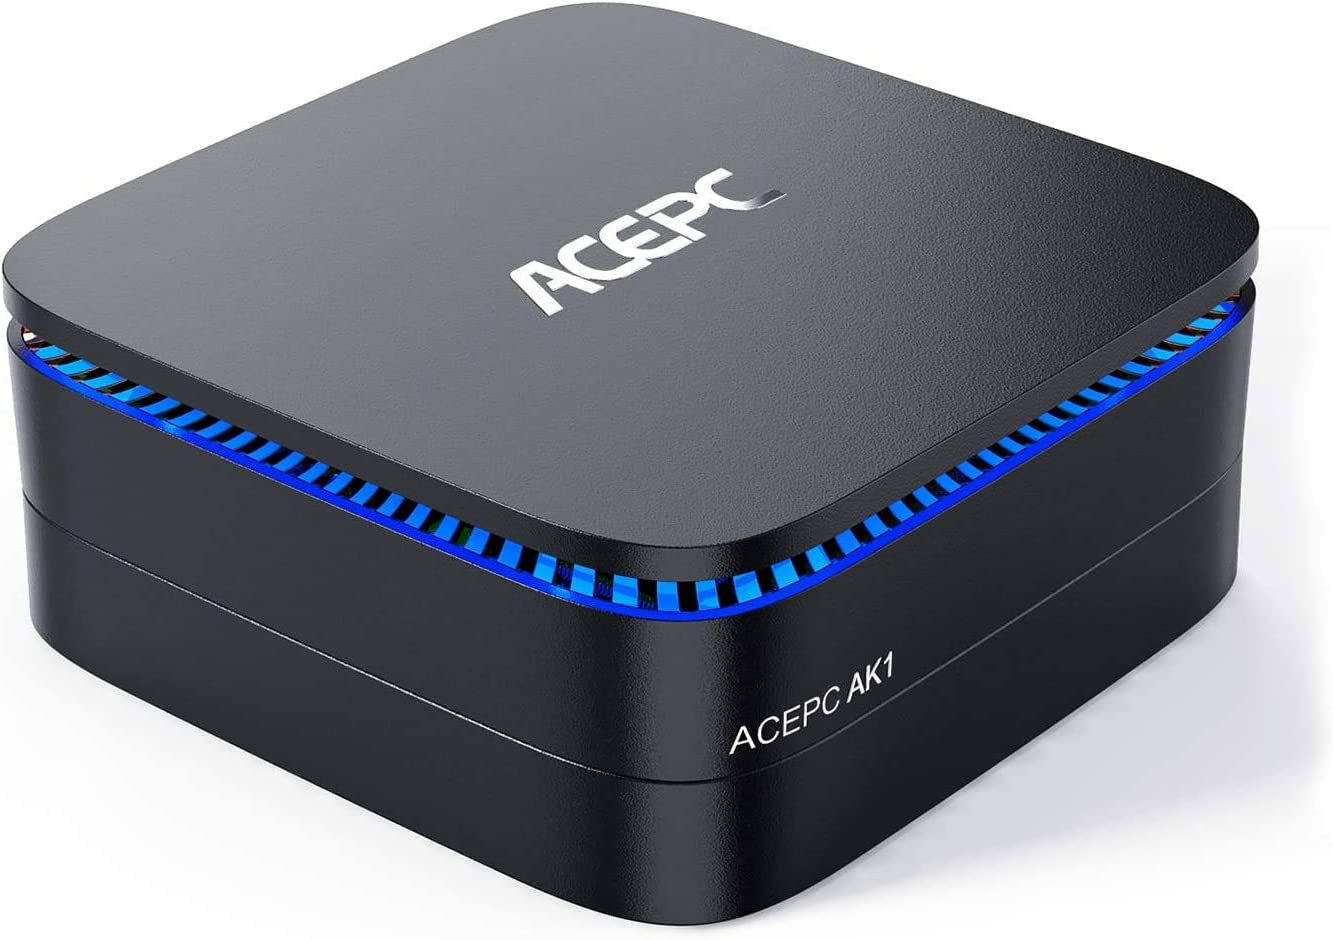 "ACEPC AK1 Mini PC,8GB RAM+256GB ROM,Intel Celeron J3455,Windows 10 Pro 4K Mini Ordenador Computer,Apoyo 2.5"" SATA SSD/HDD/4K/Dual WiFi 2.4G+5G/Bluetooth 4.2/USB 3.0"